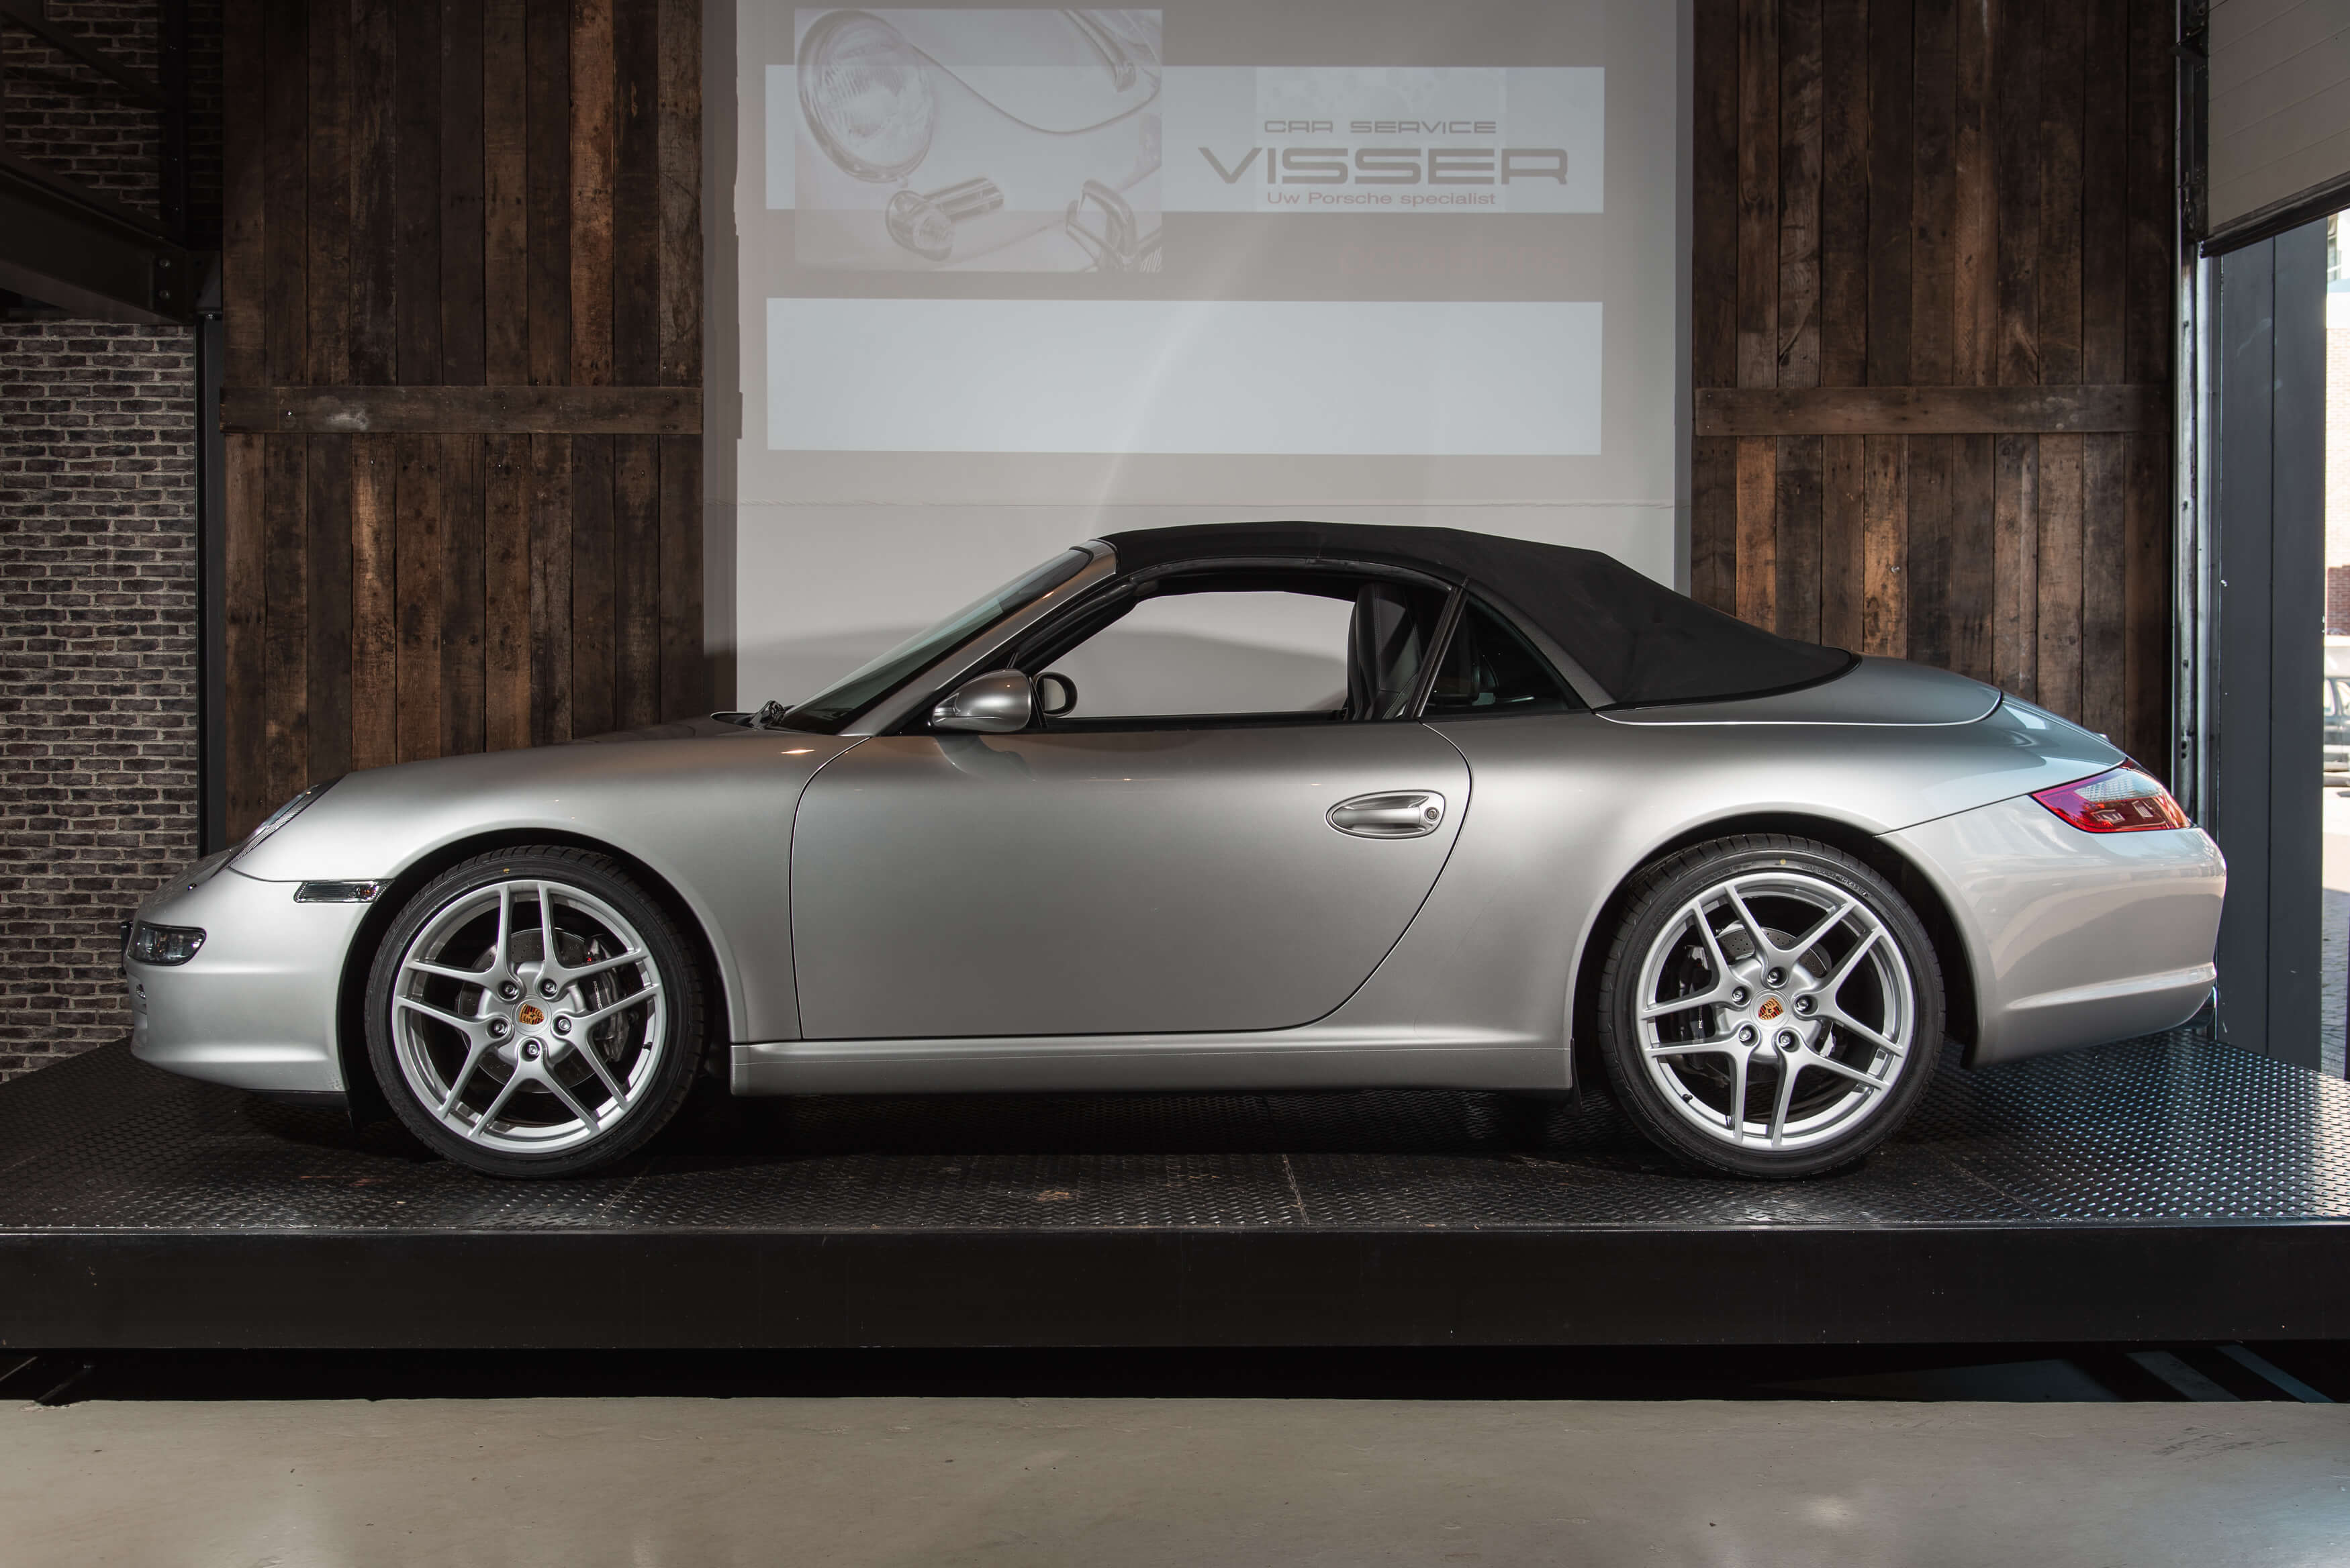 Porsche 997 Carrera 2 automaat Car Service Visser gespecialiseerd in Porsche - 3